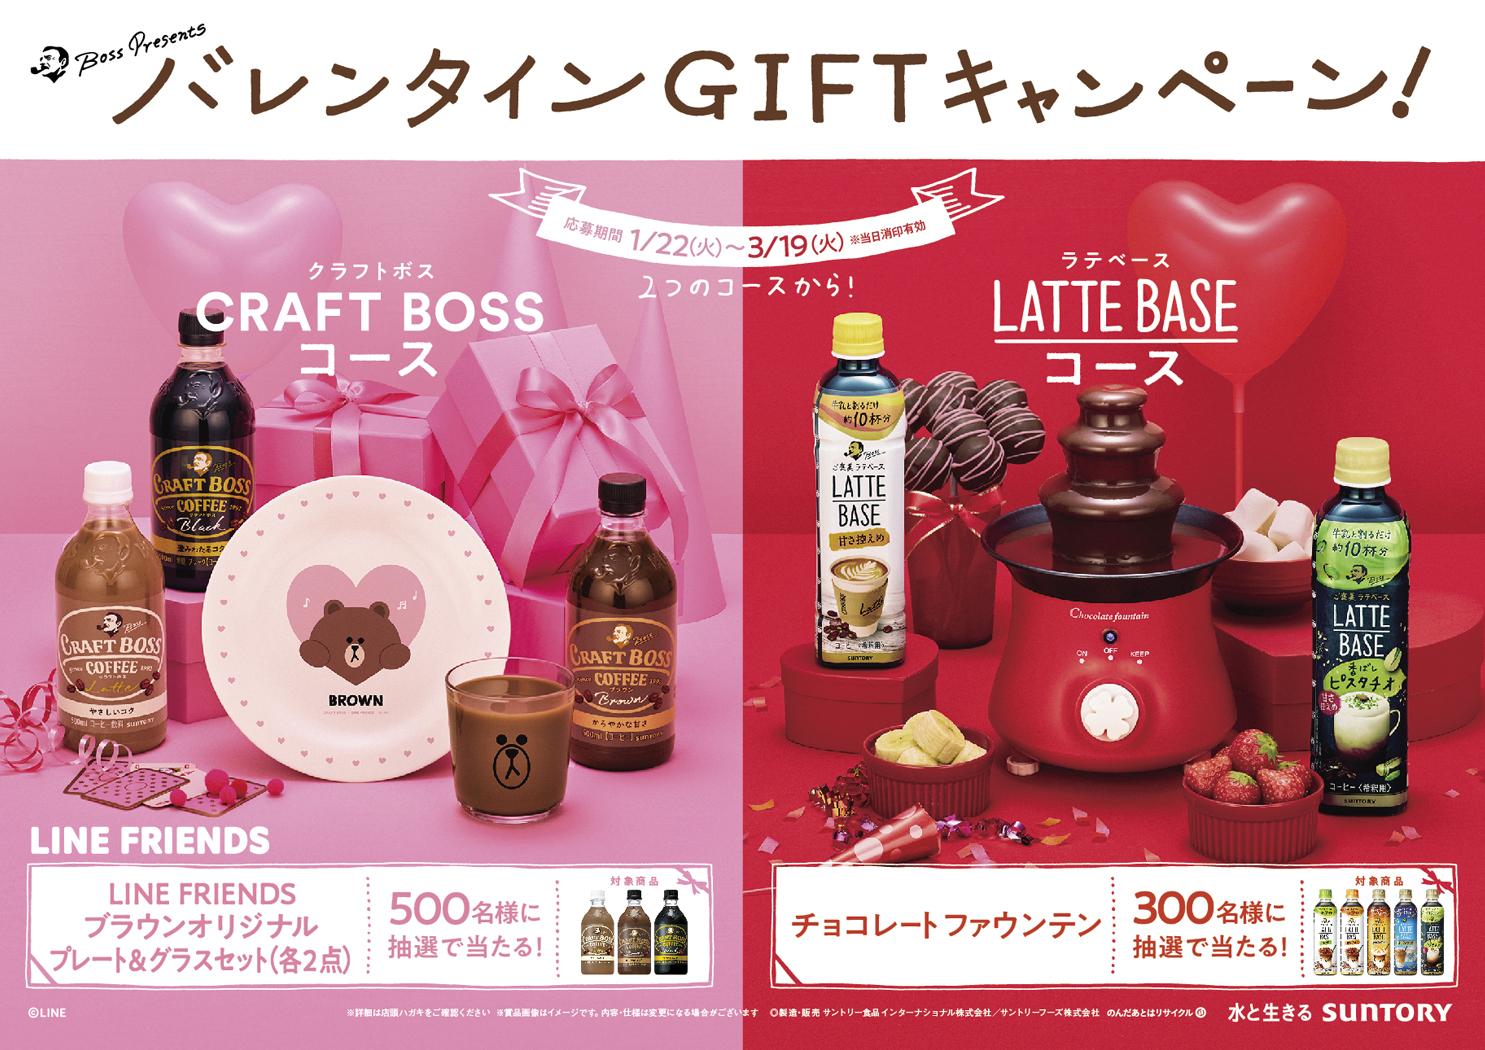 Suntory boss LatteBase×CRAFTBOSS campaign